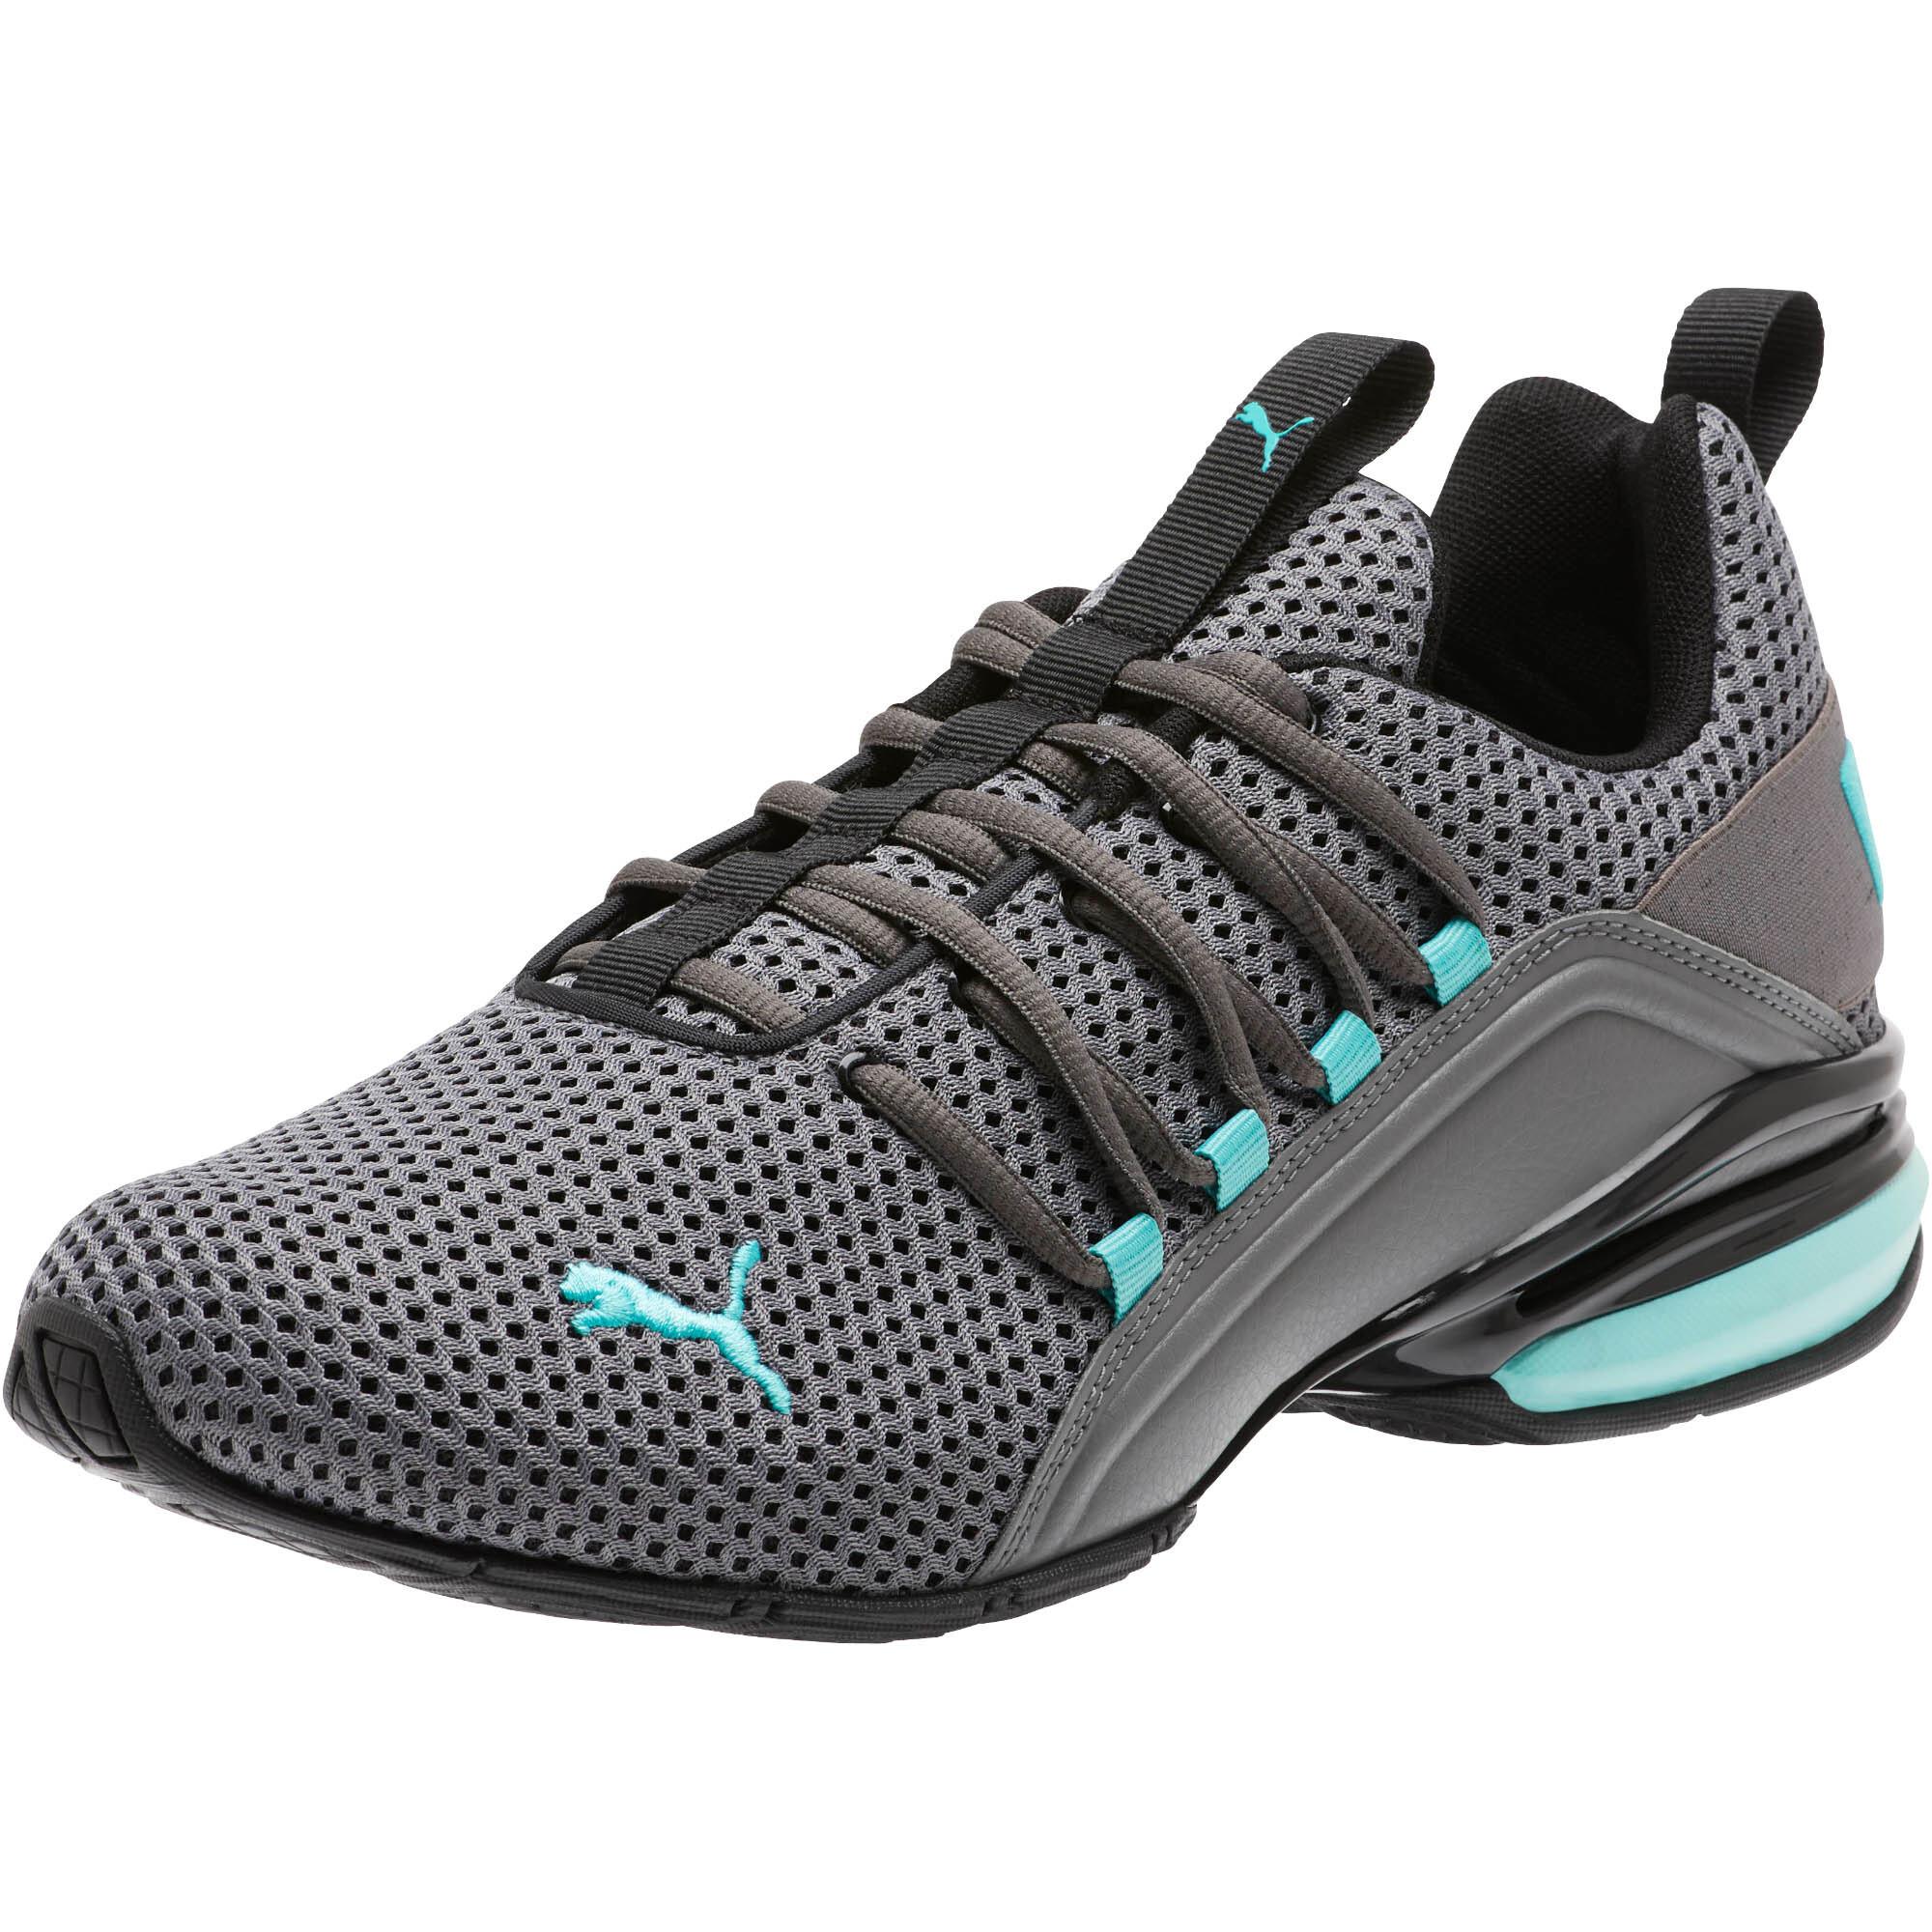 PUMA-Axelion-Breathe-Men-s-Training-Shoes-Men-Shoe-Running thumbnail 9